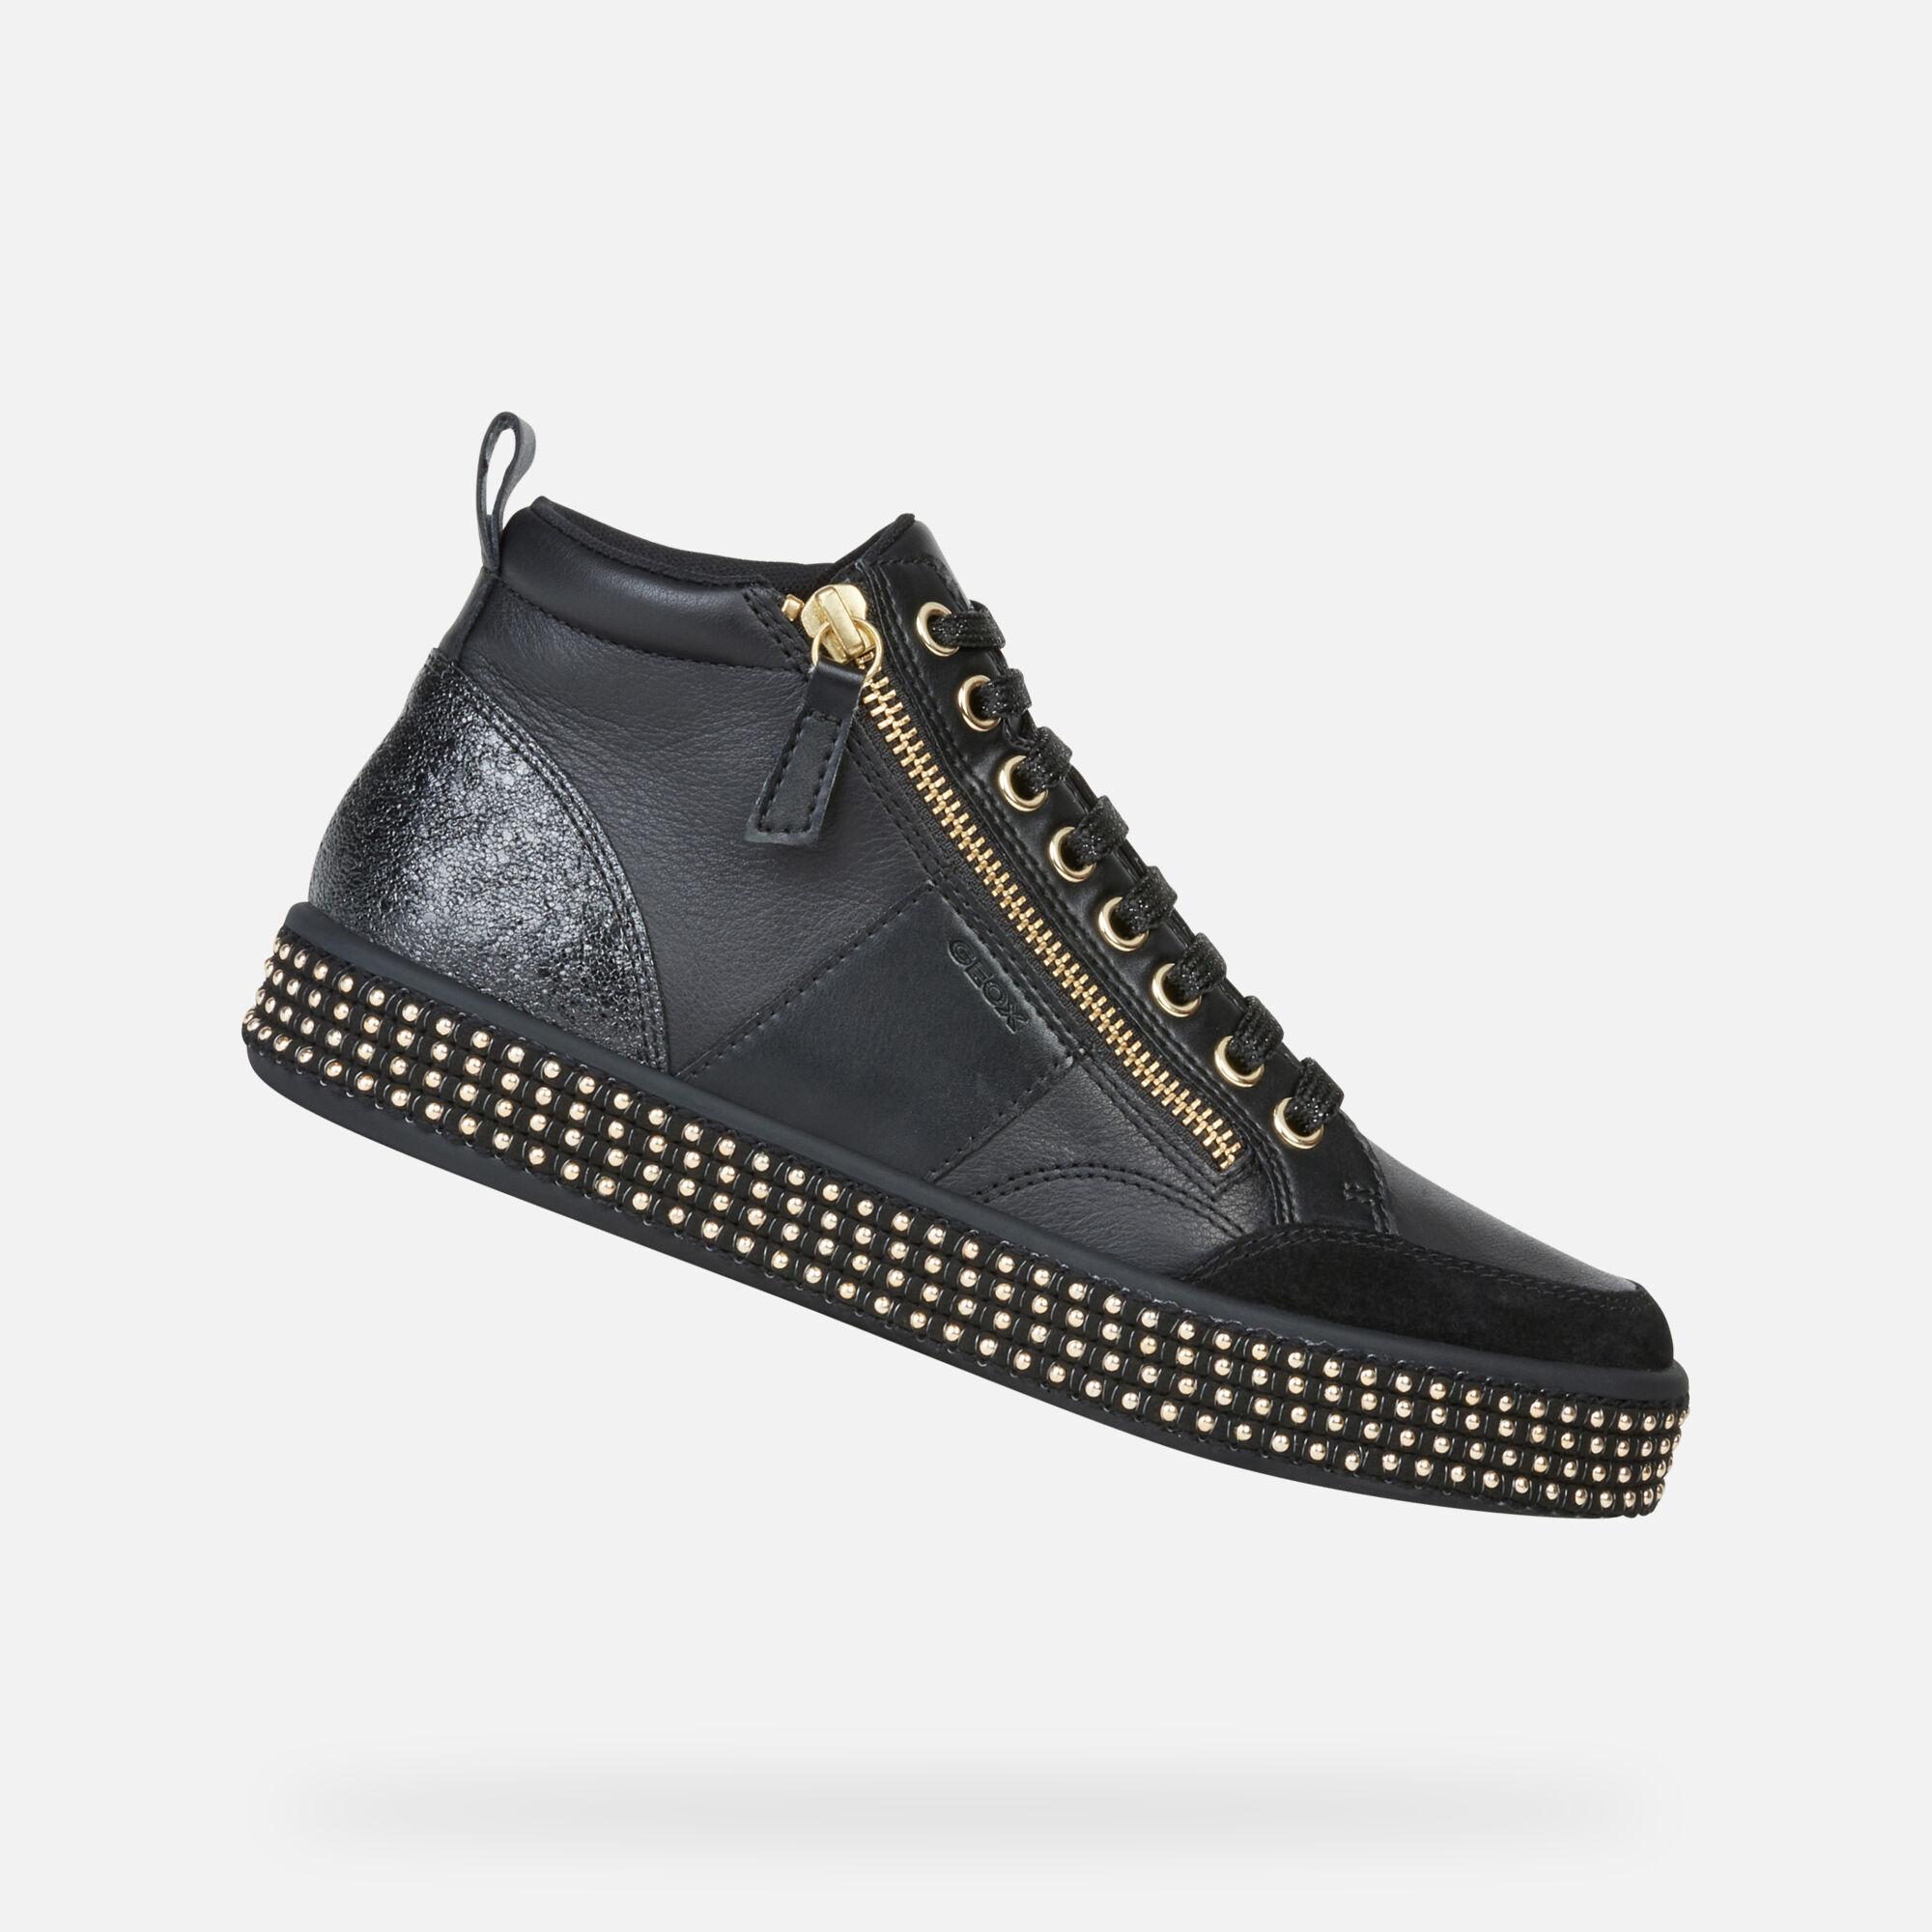 GEOX Sneakers Nero Donna Scarpe Sneakers,geox scarpe autunno